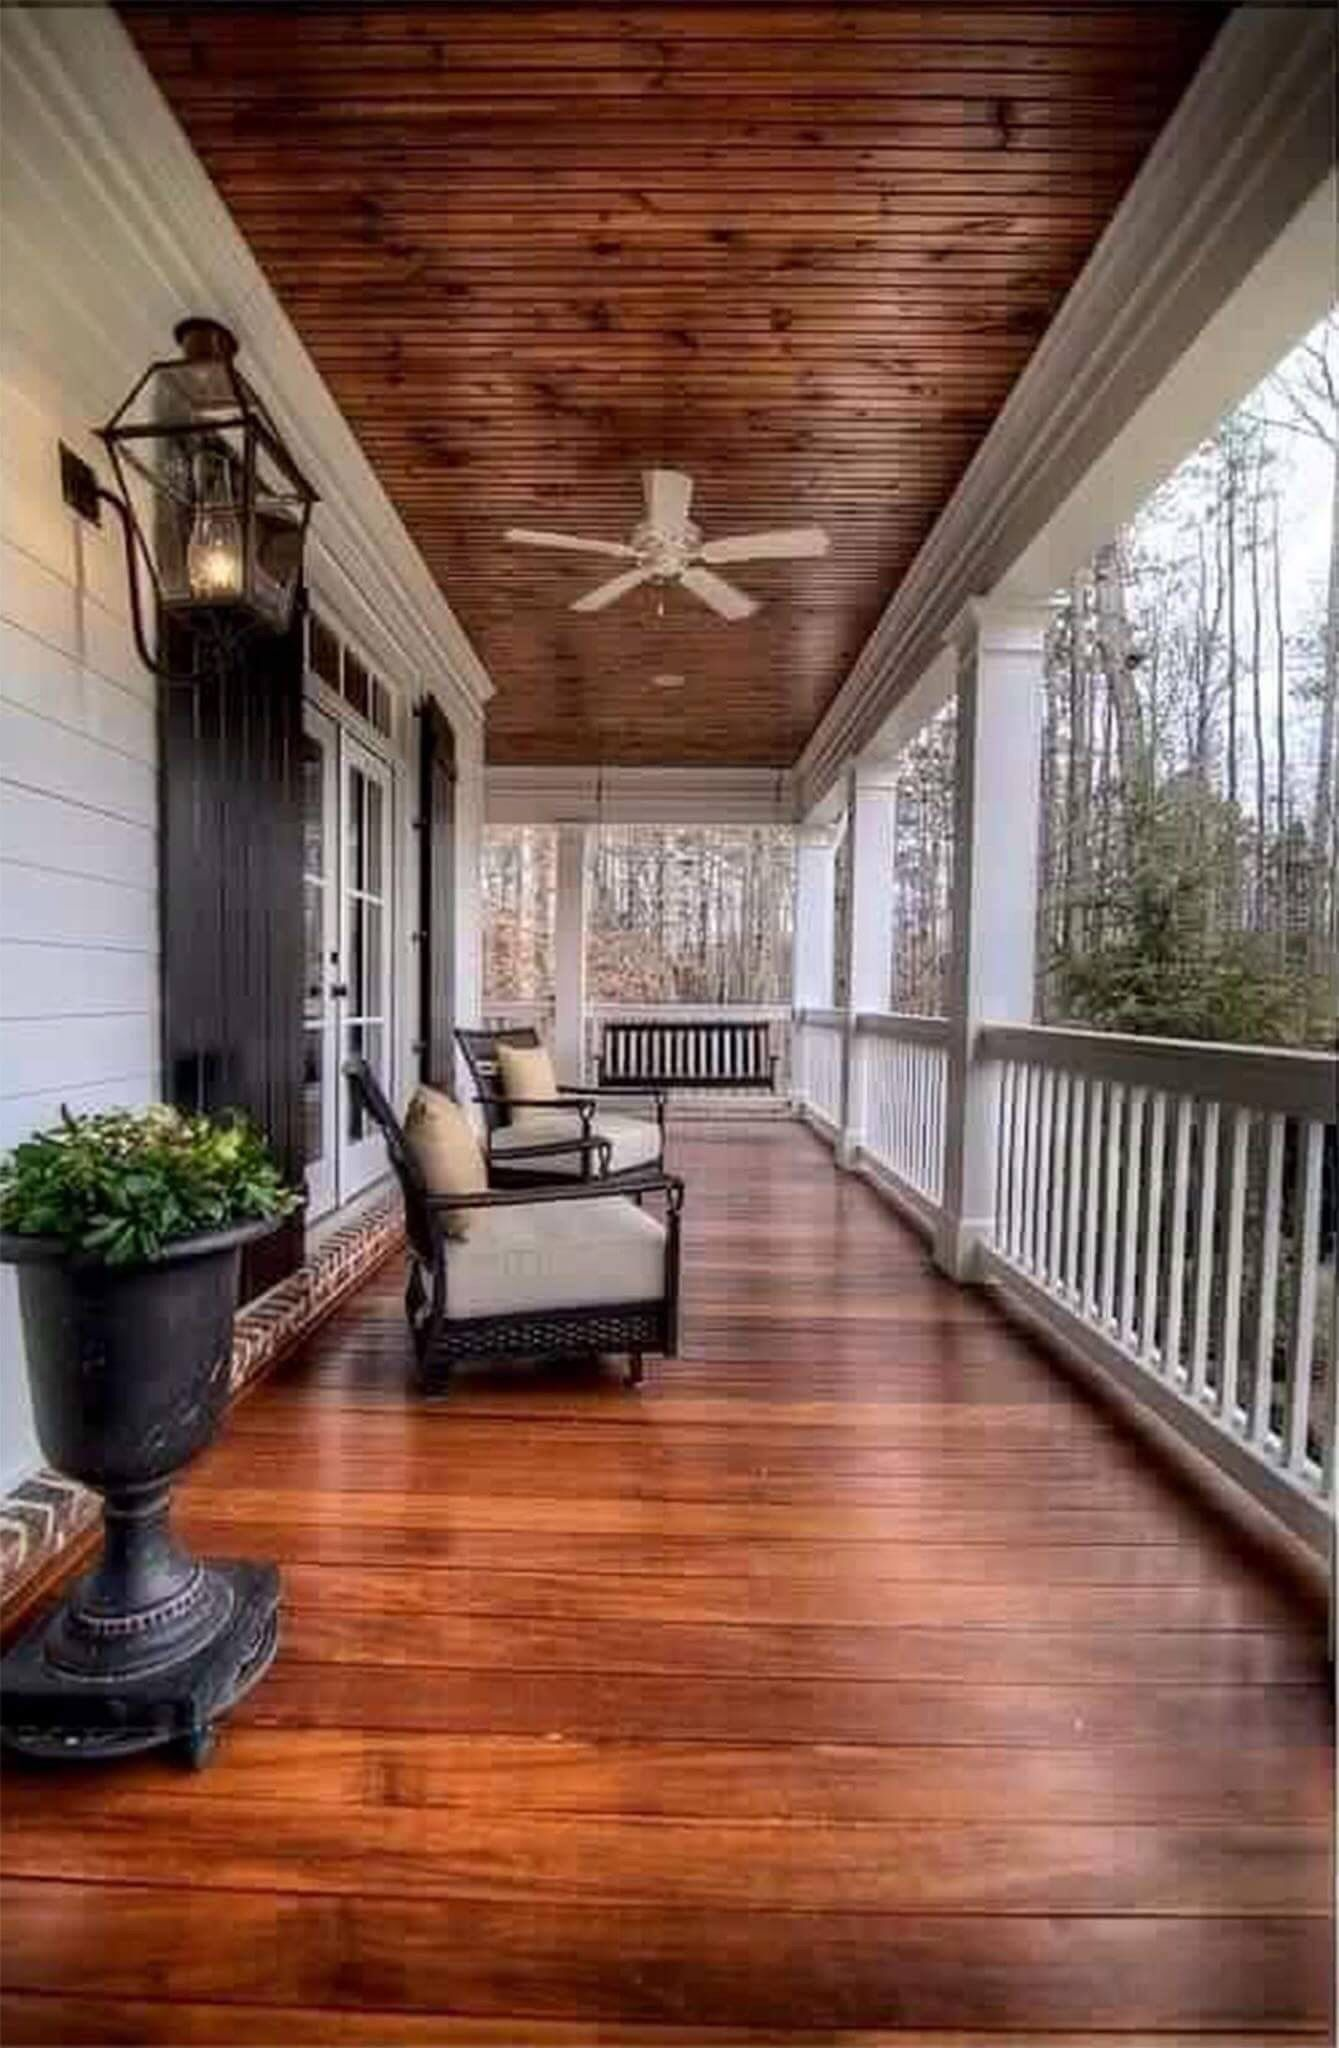 House porch | ❥House Decorating.•♥•. | Pinterest | Häuschen